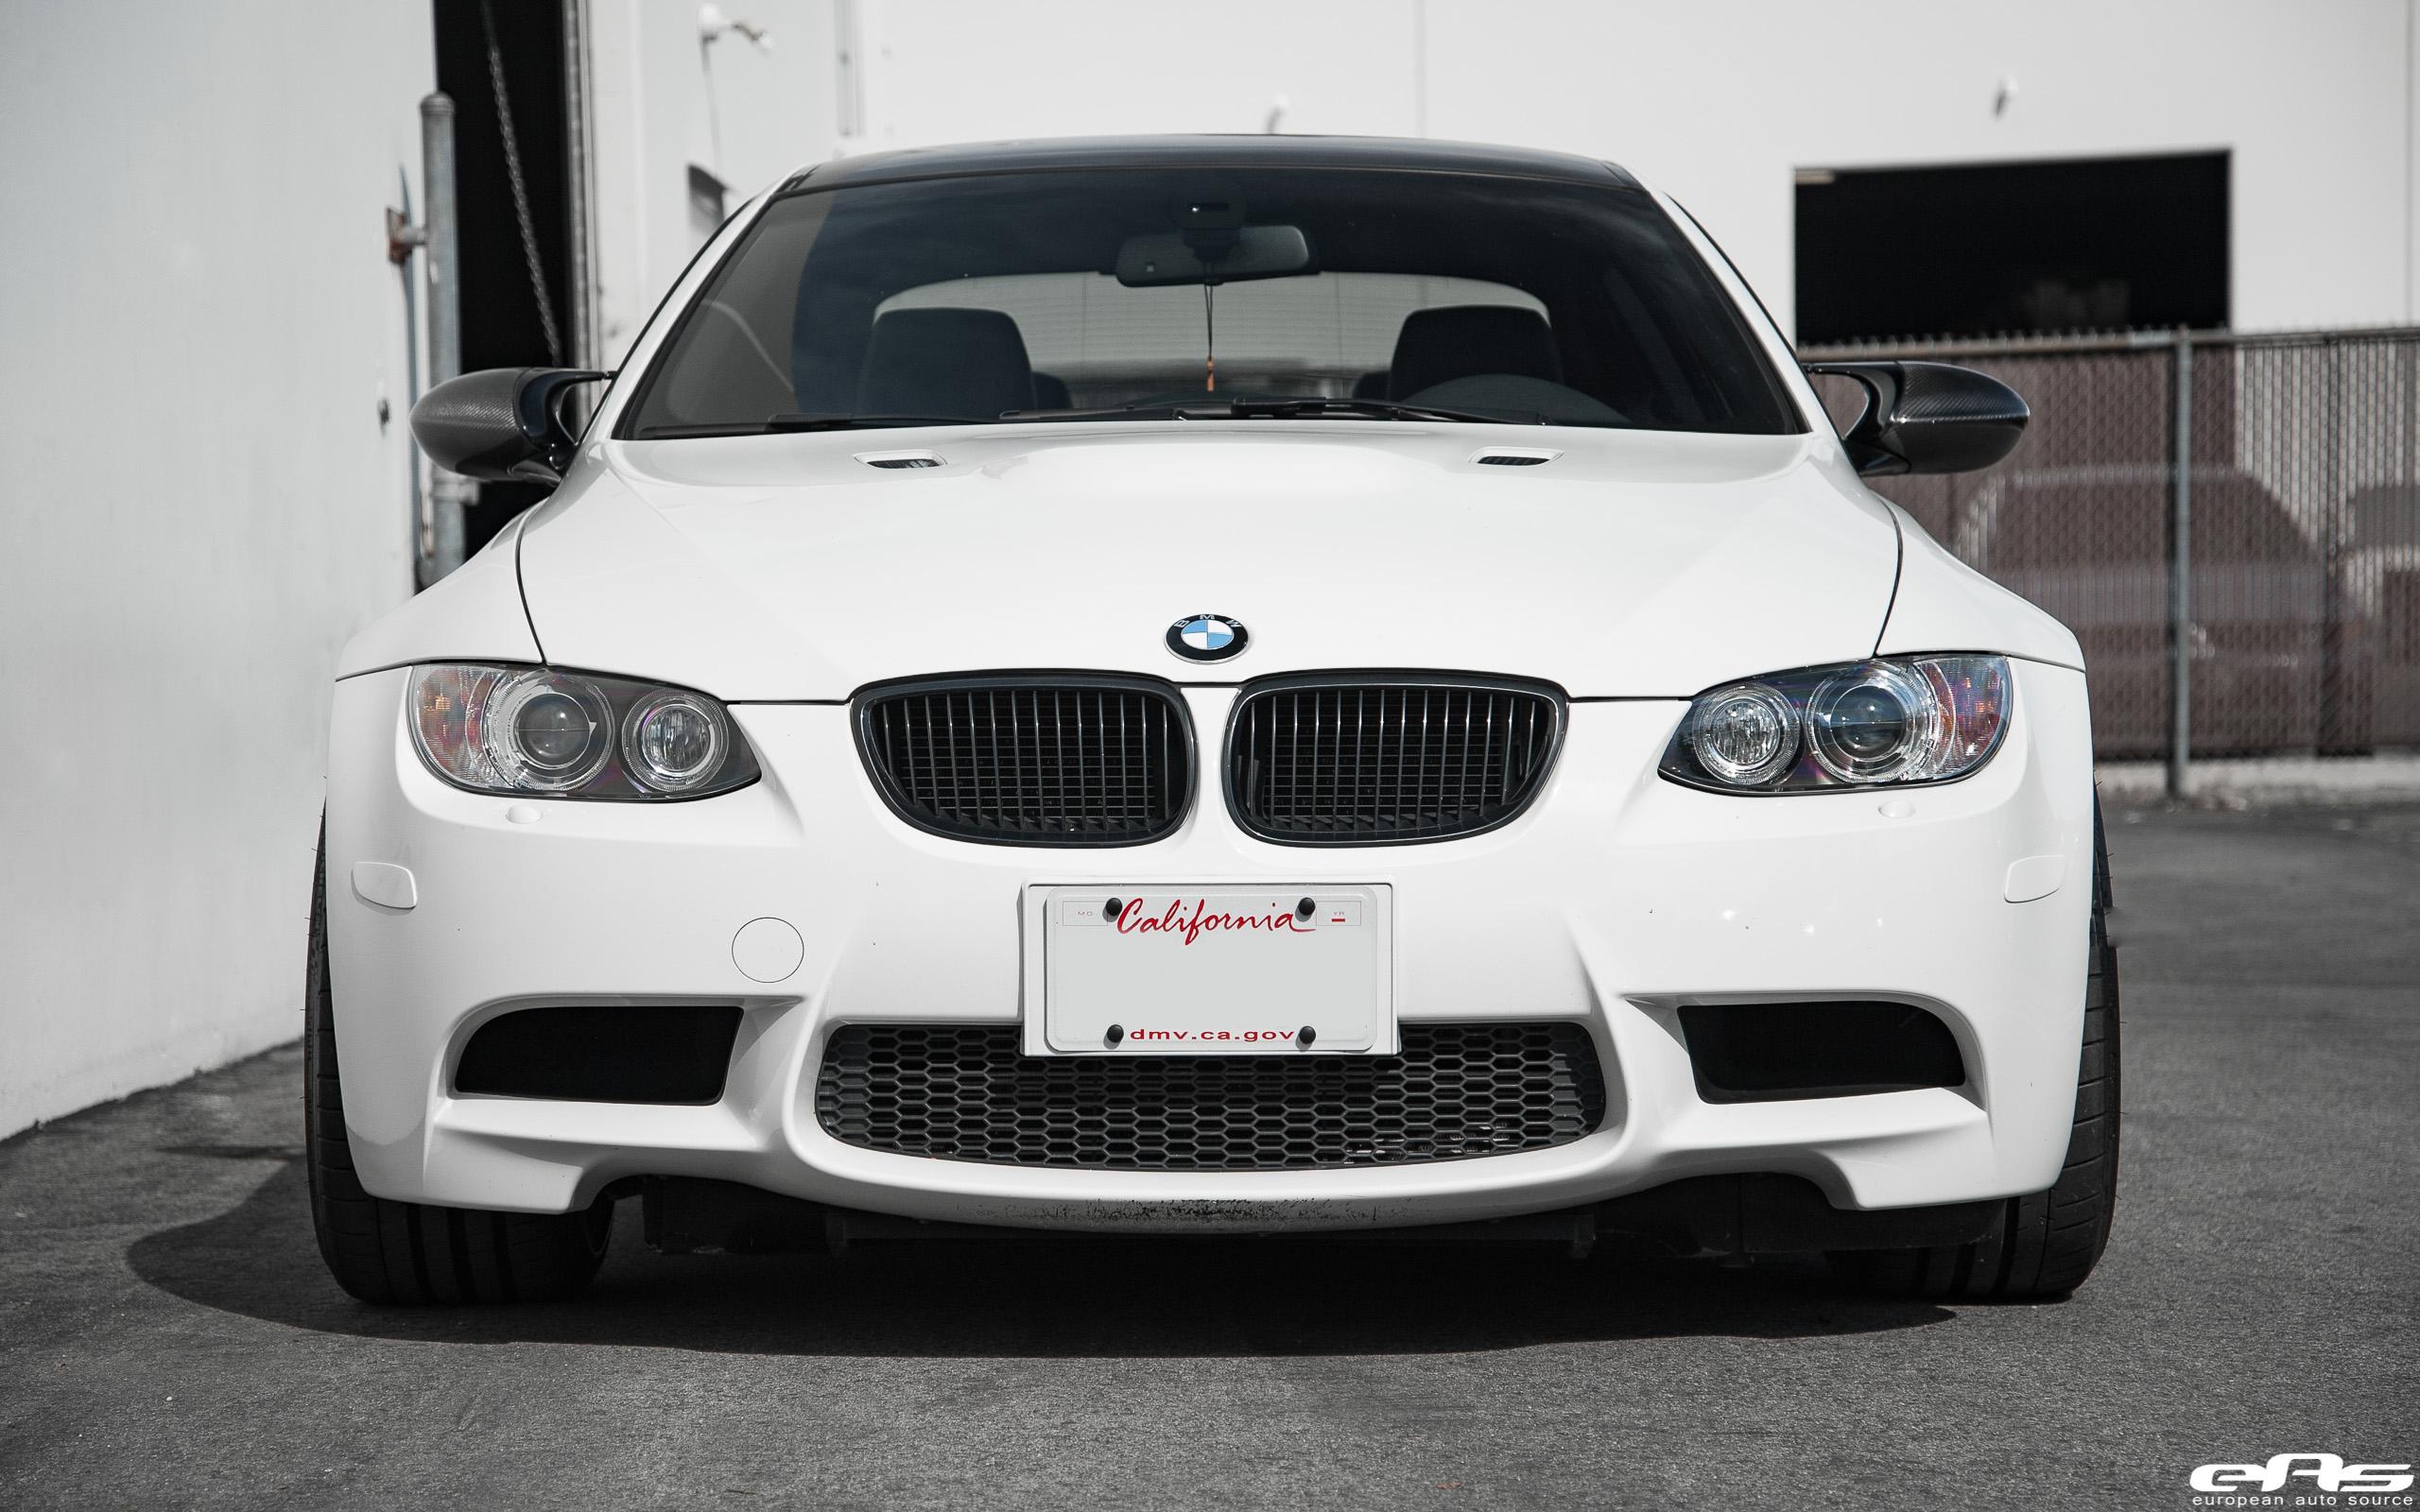 Alpine White BMW E92 M3 With Vossen VWS 3 Wheels Image 4